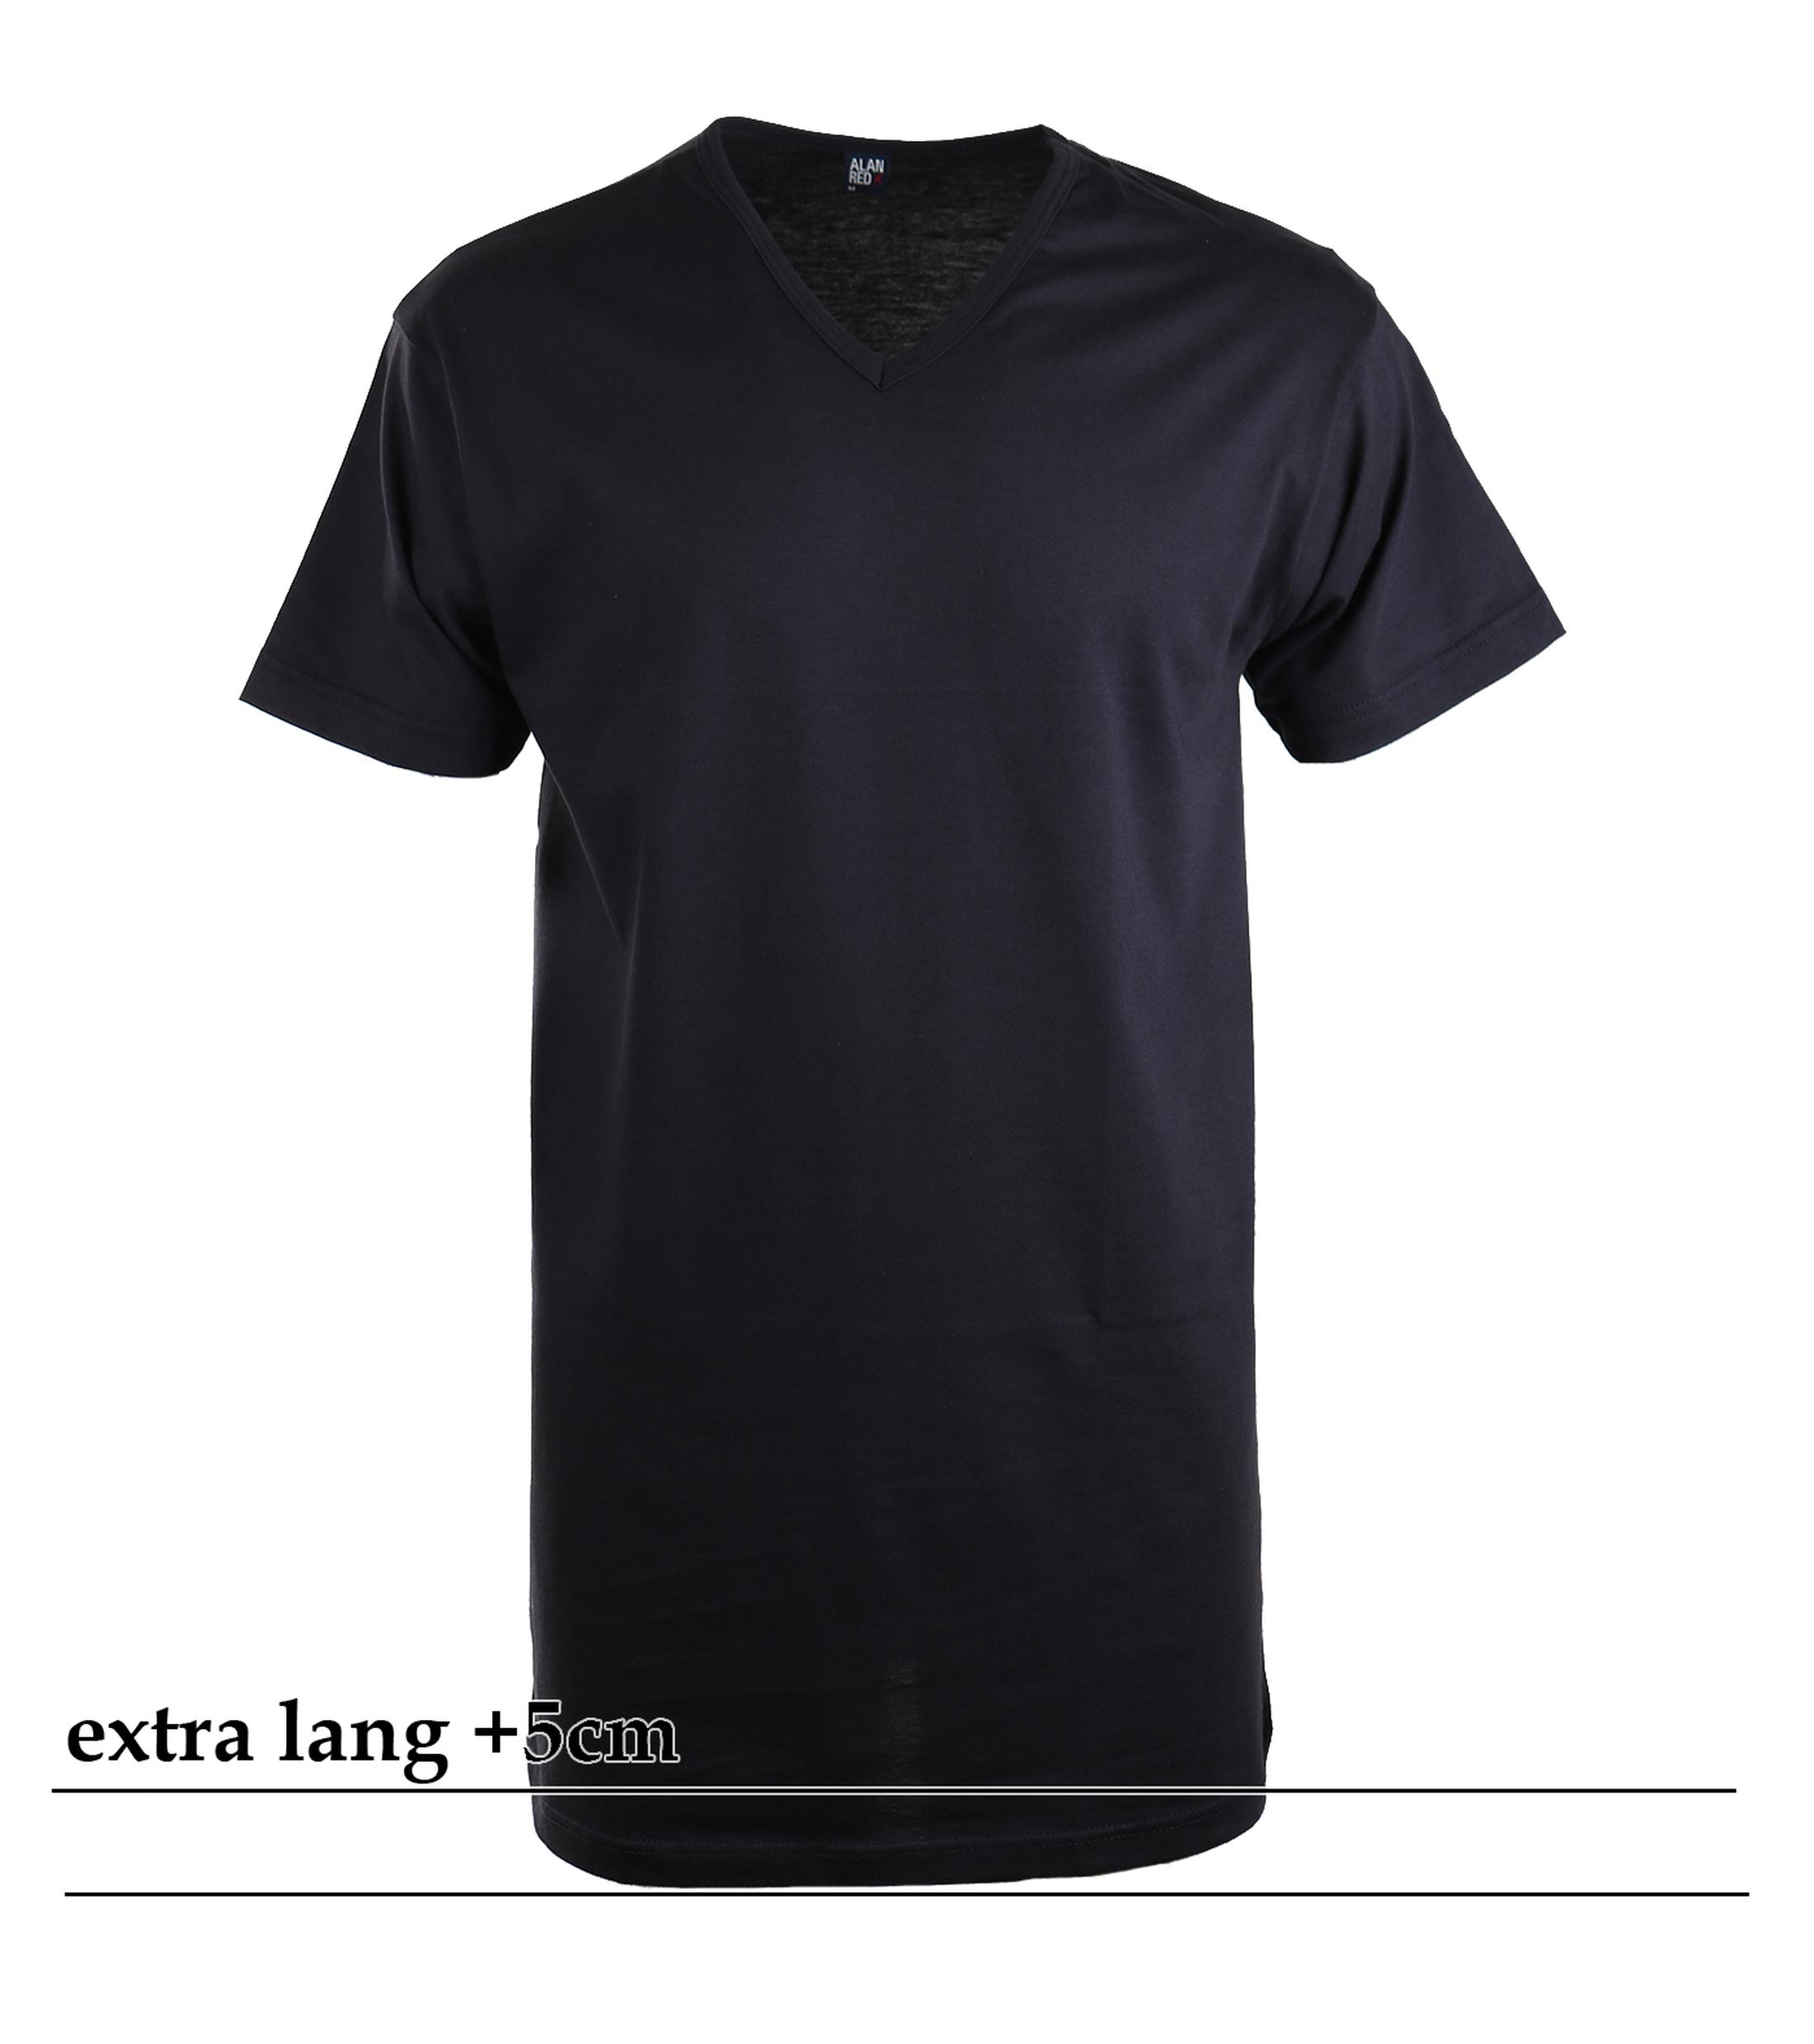 extra lange t shirts vermont navy 1pack online bestellen suitable. Black Bedroom Furniture Sets. Home Design Ideas